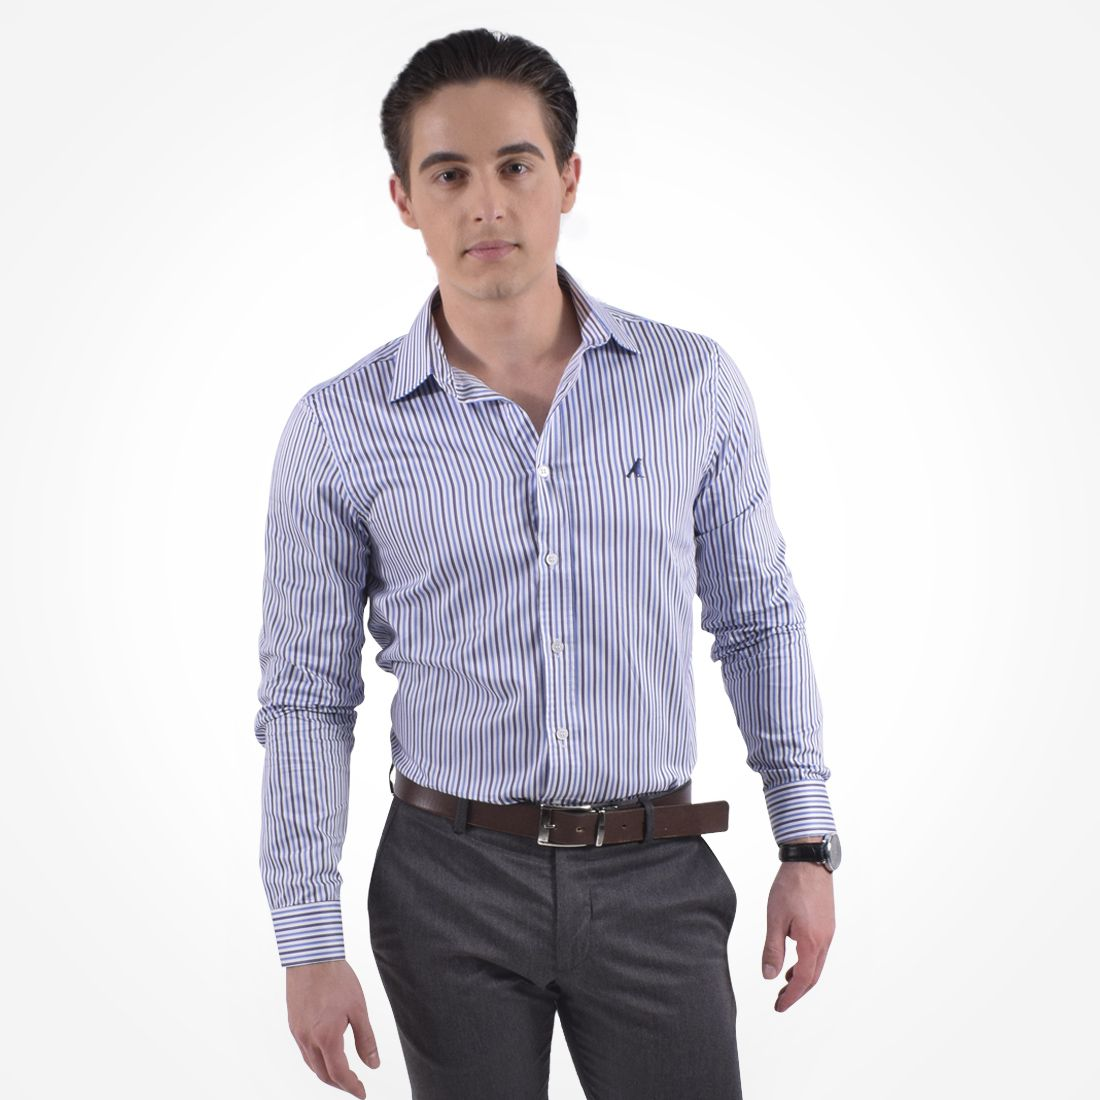 100230 - Camisa Social Listrada Masculina Slim - LEVOK